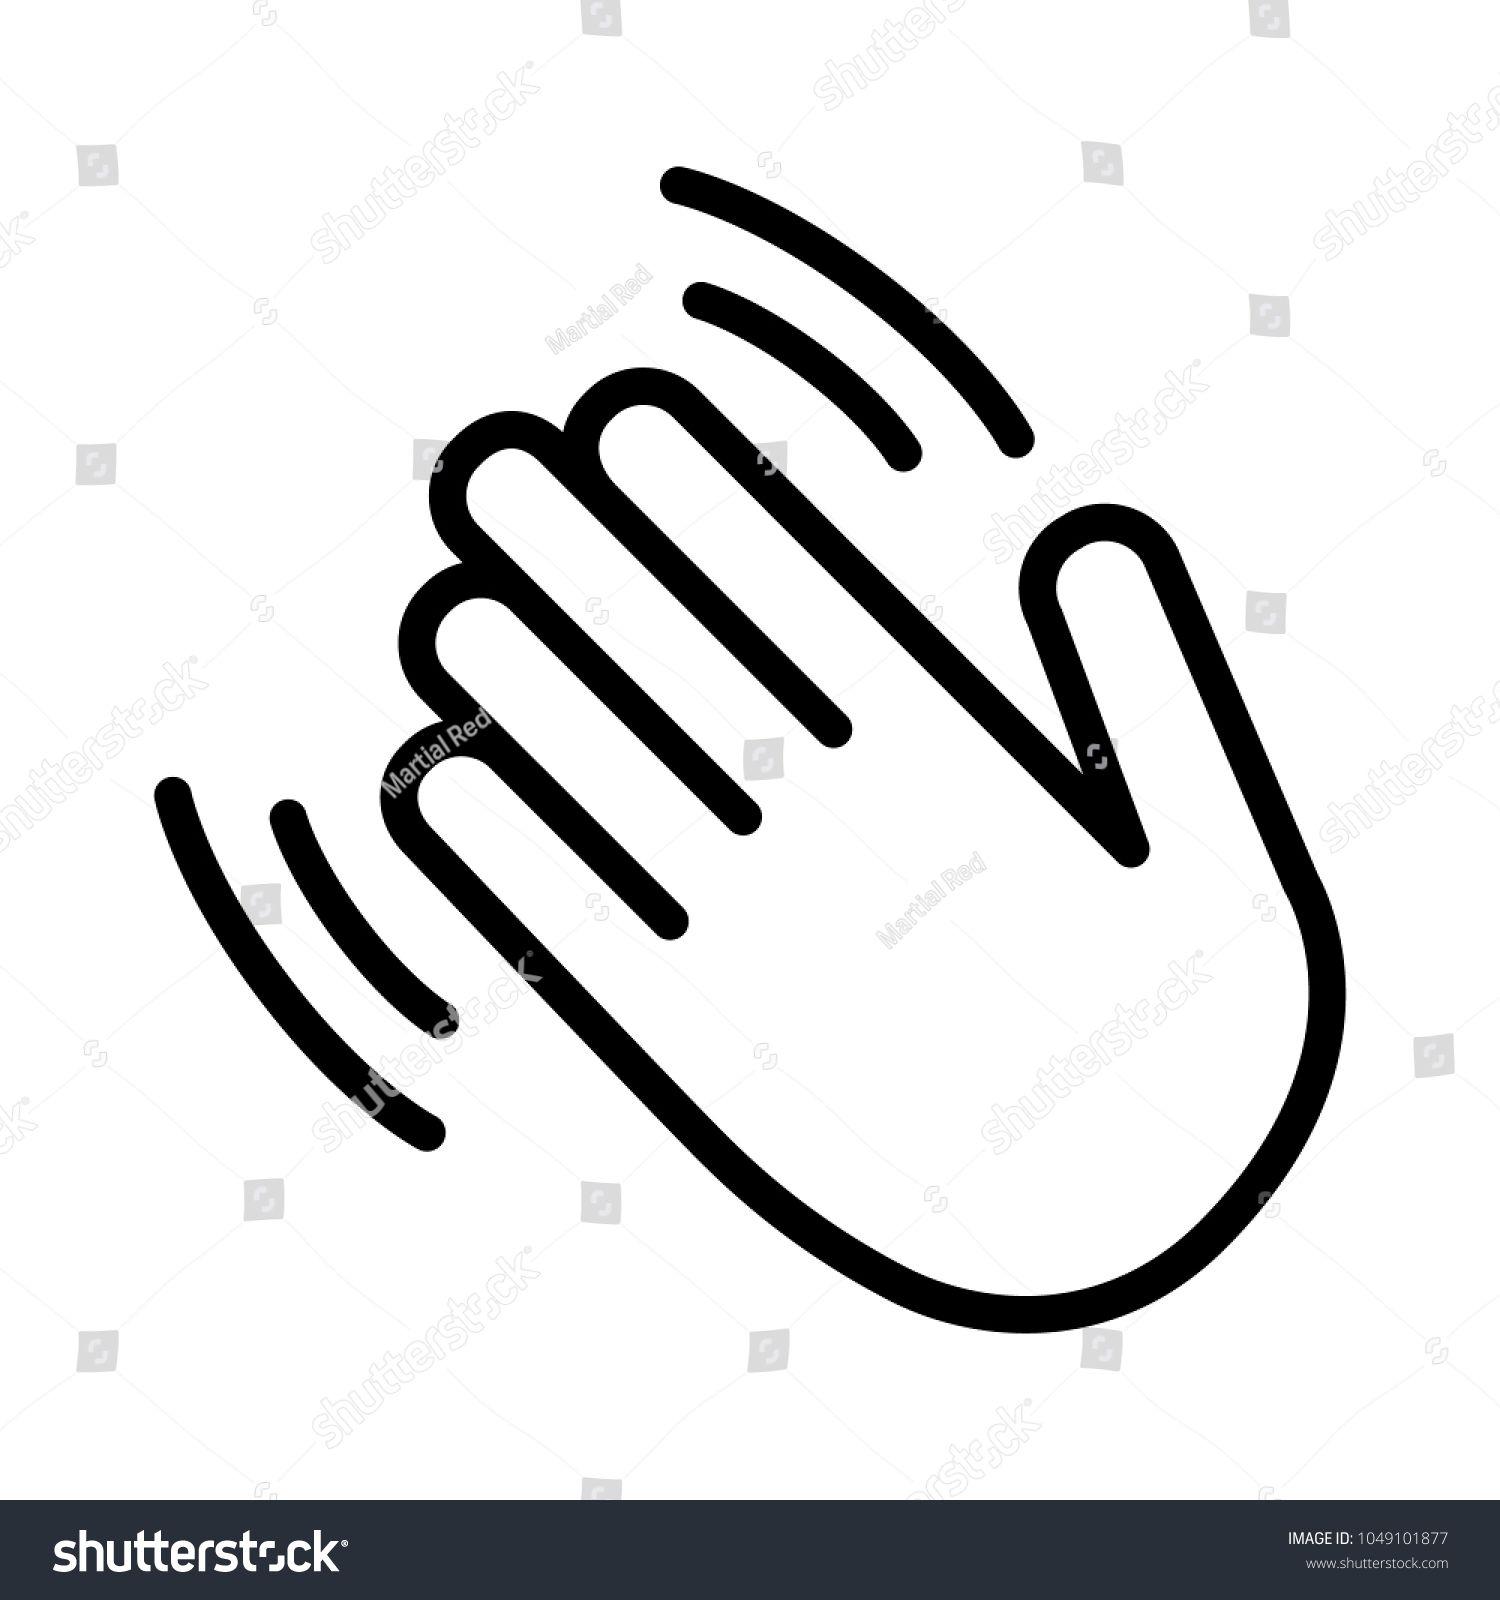 Hand wave \u002F waving hi or hello gesture line art